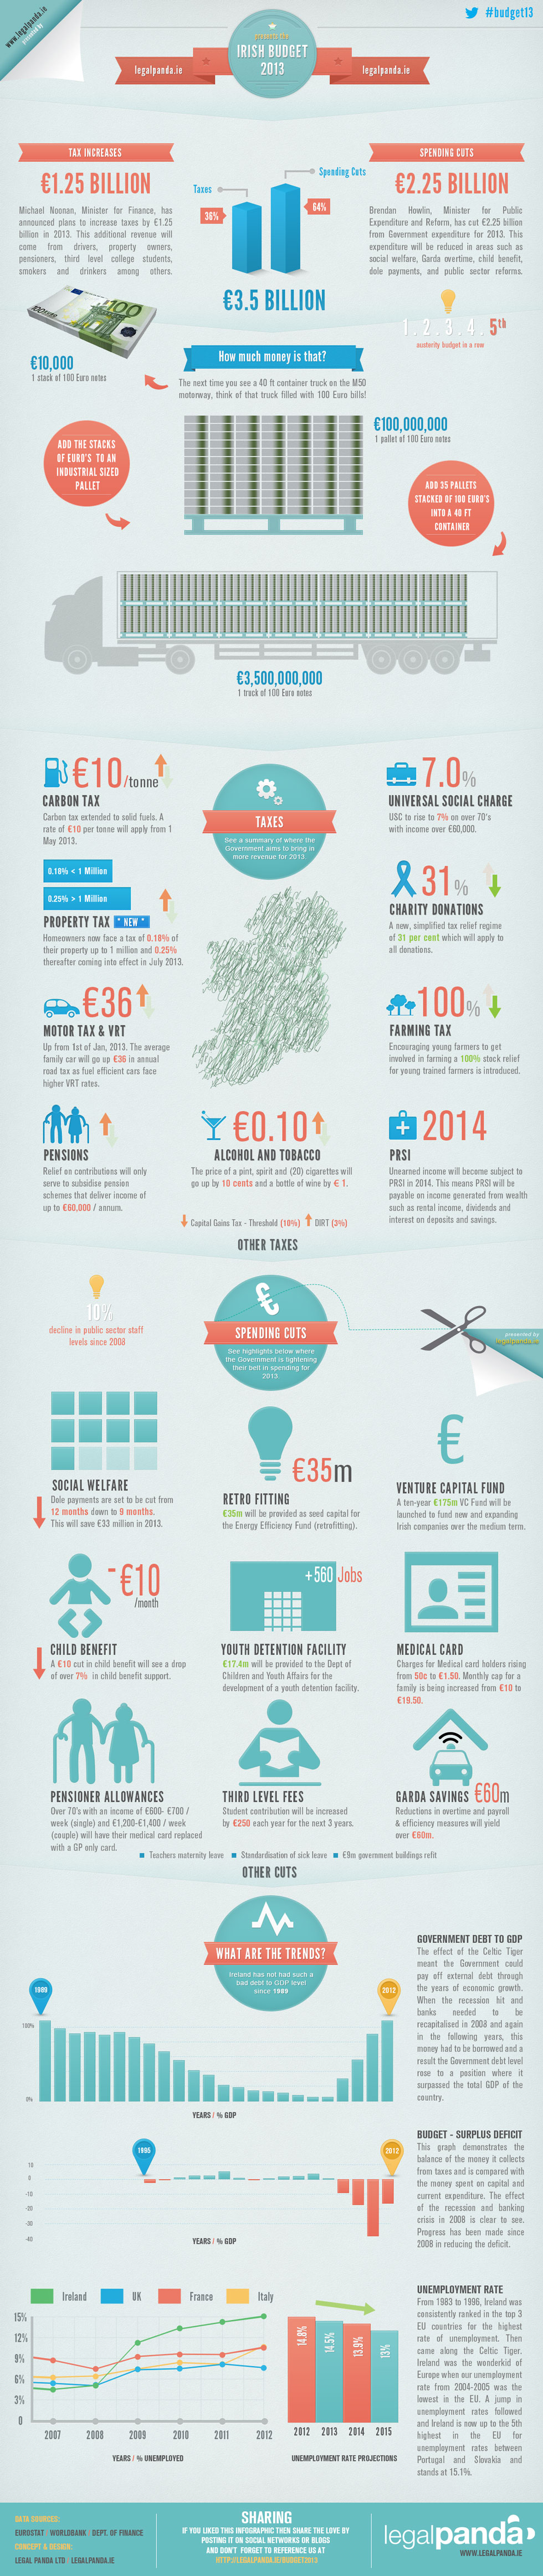 Irish Budget 2013